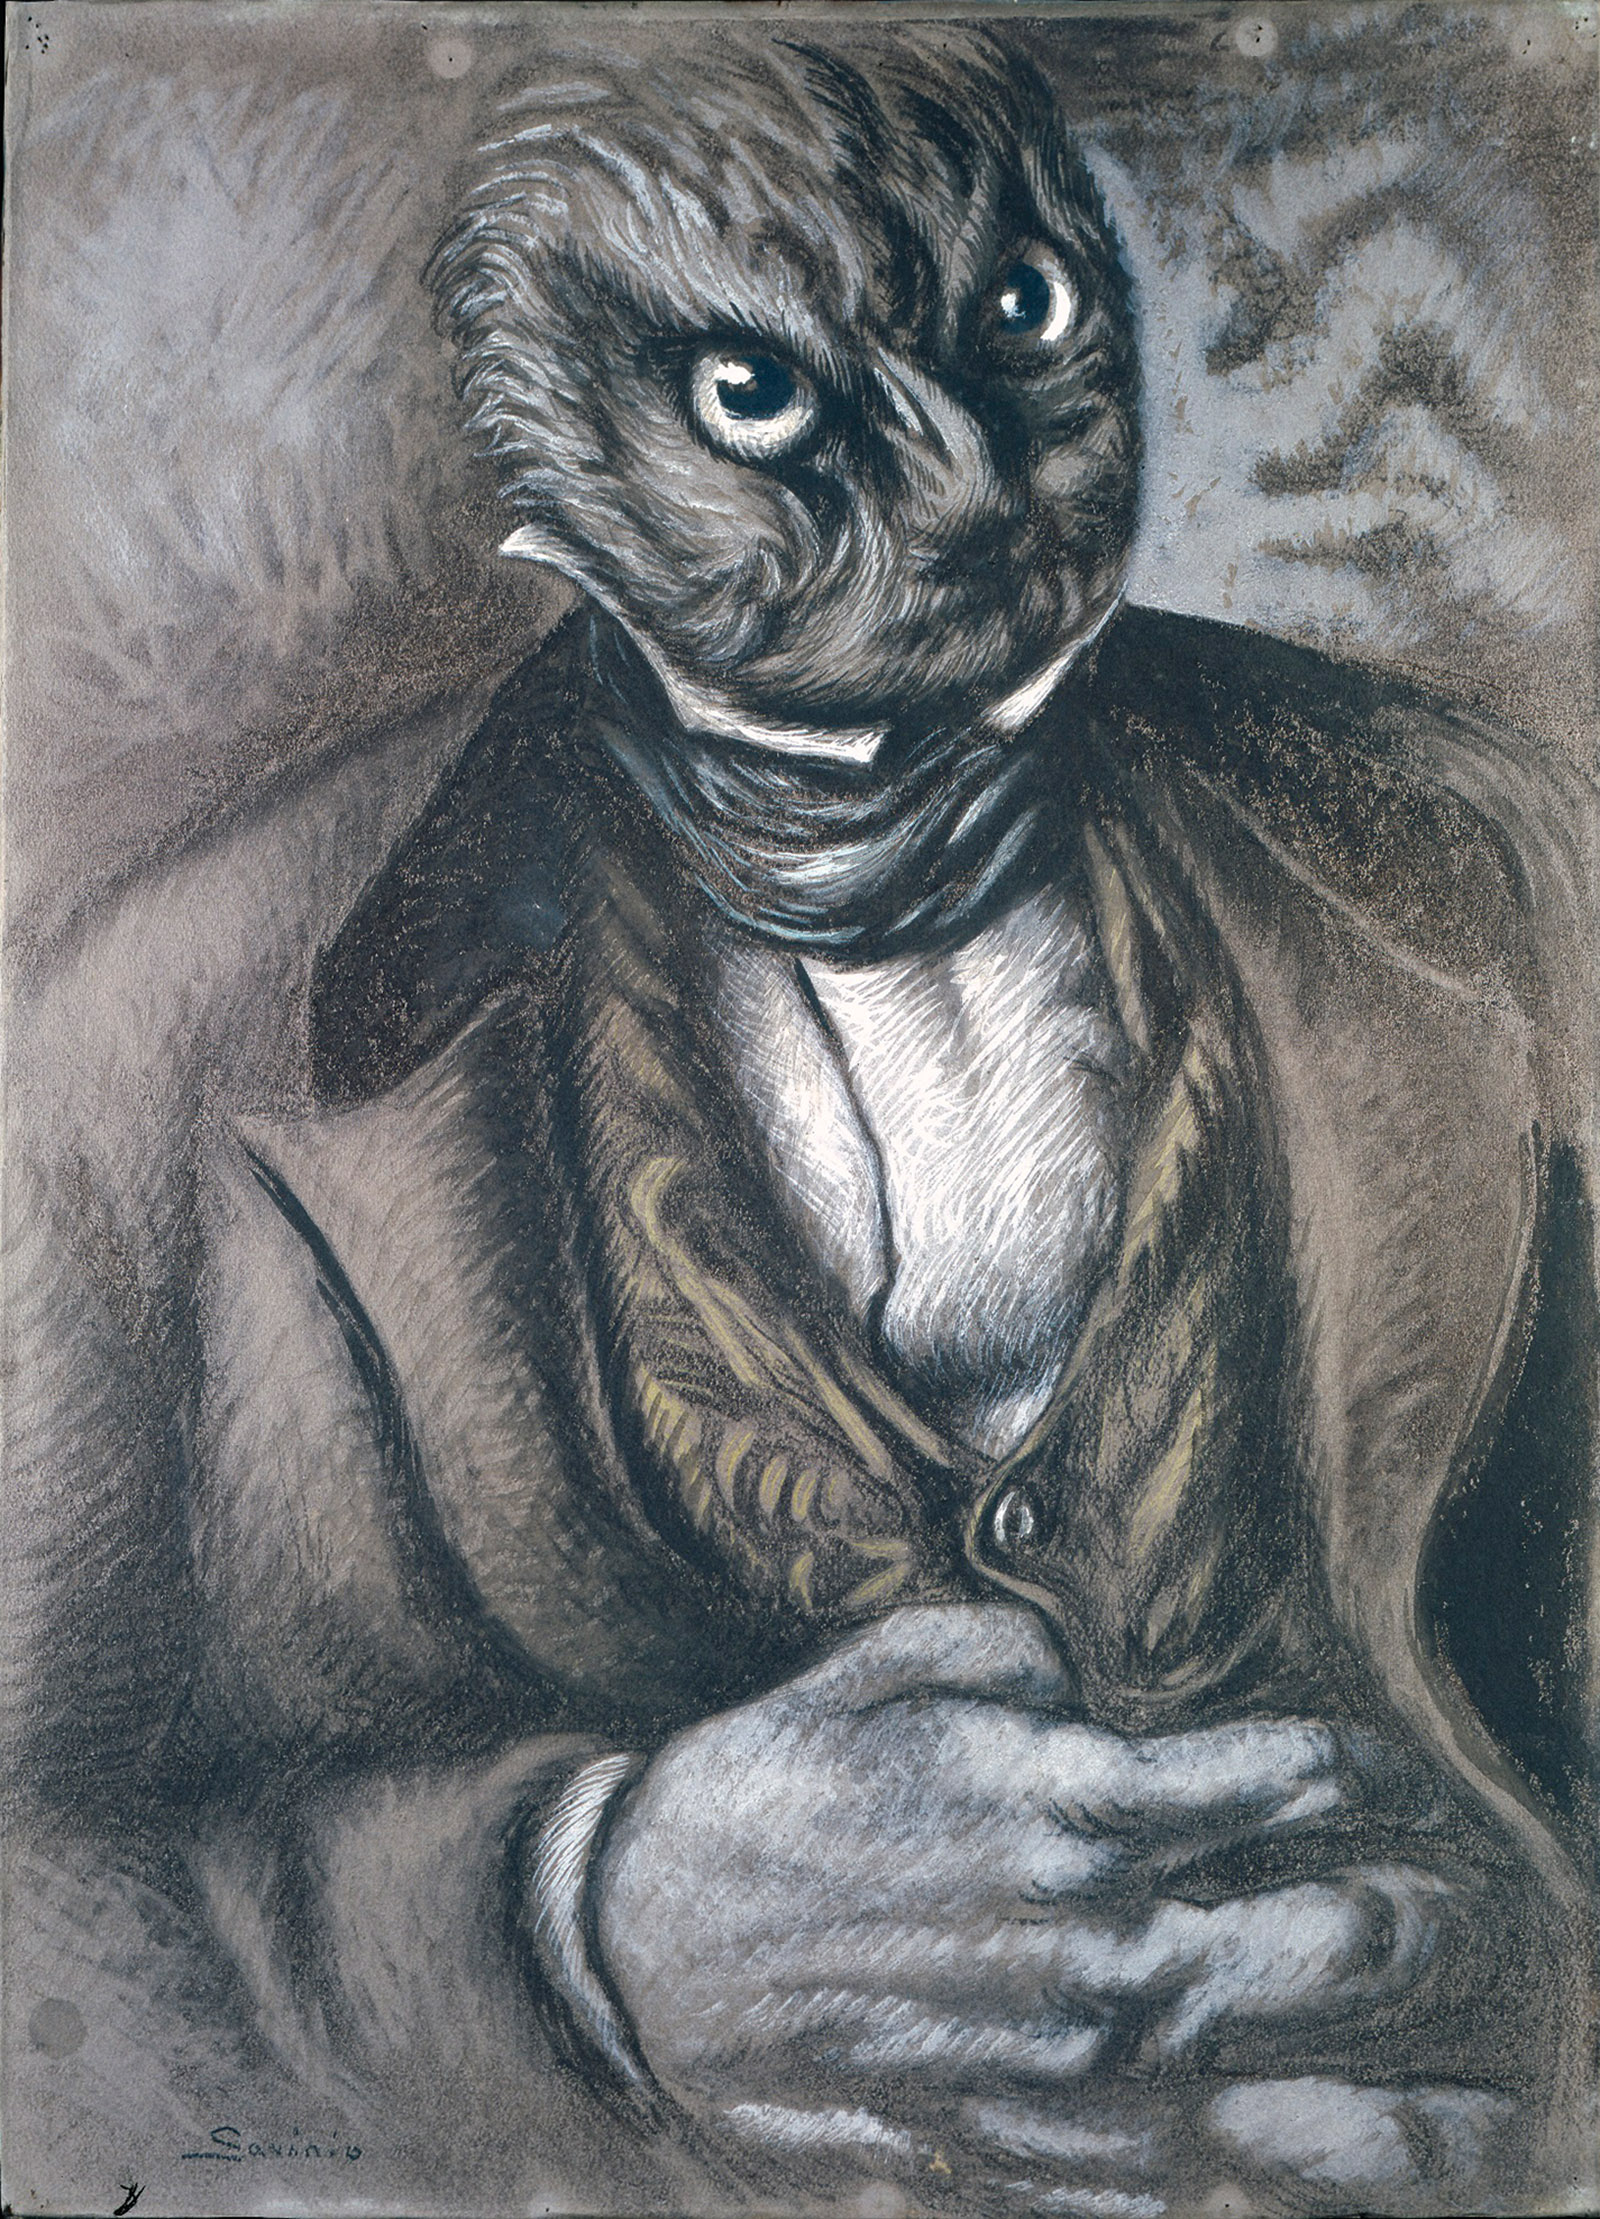 Alberto Savinio: Self-Portrait as an Owl, 1936